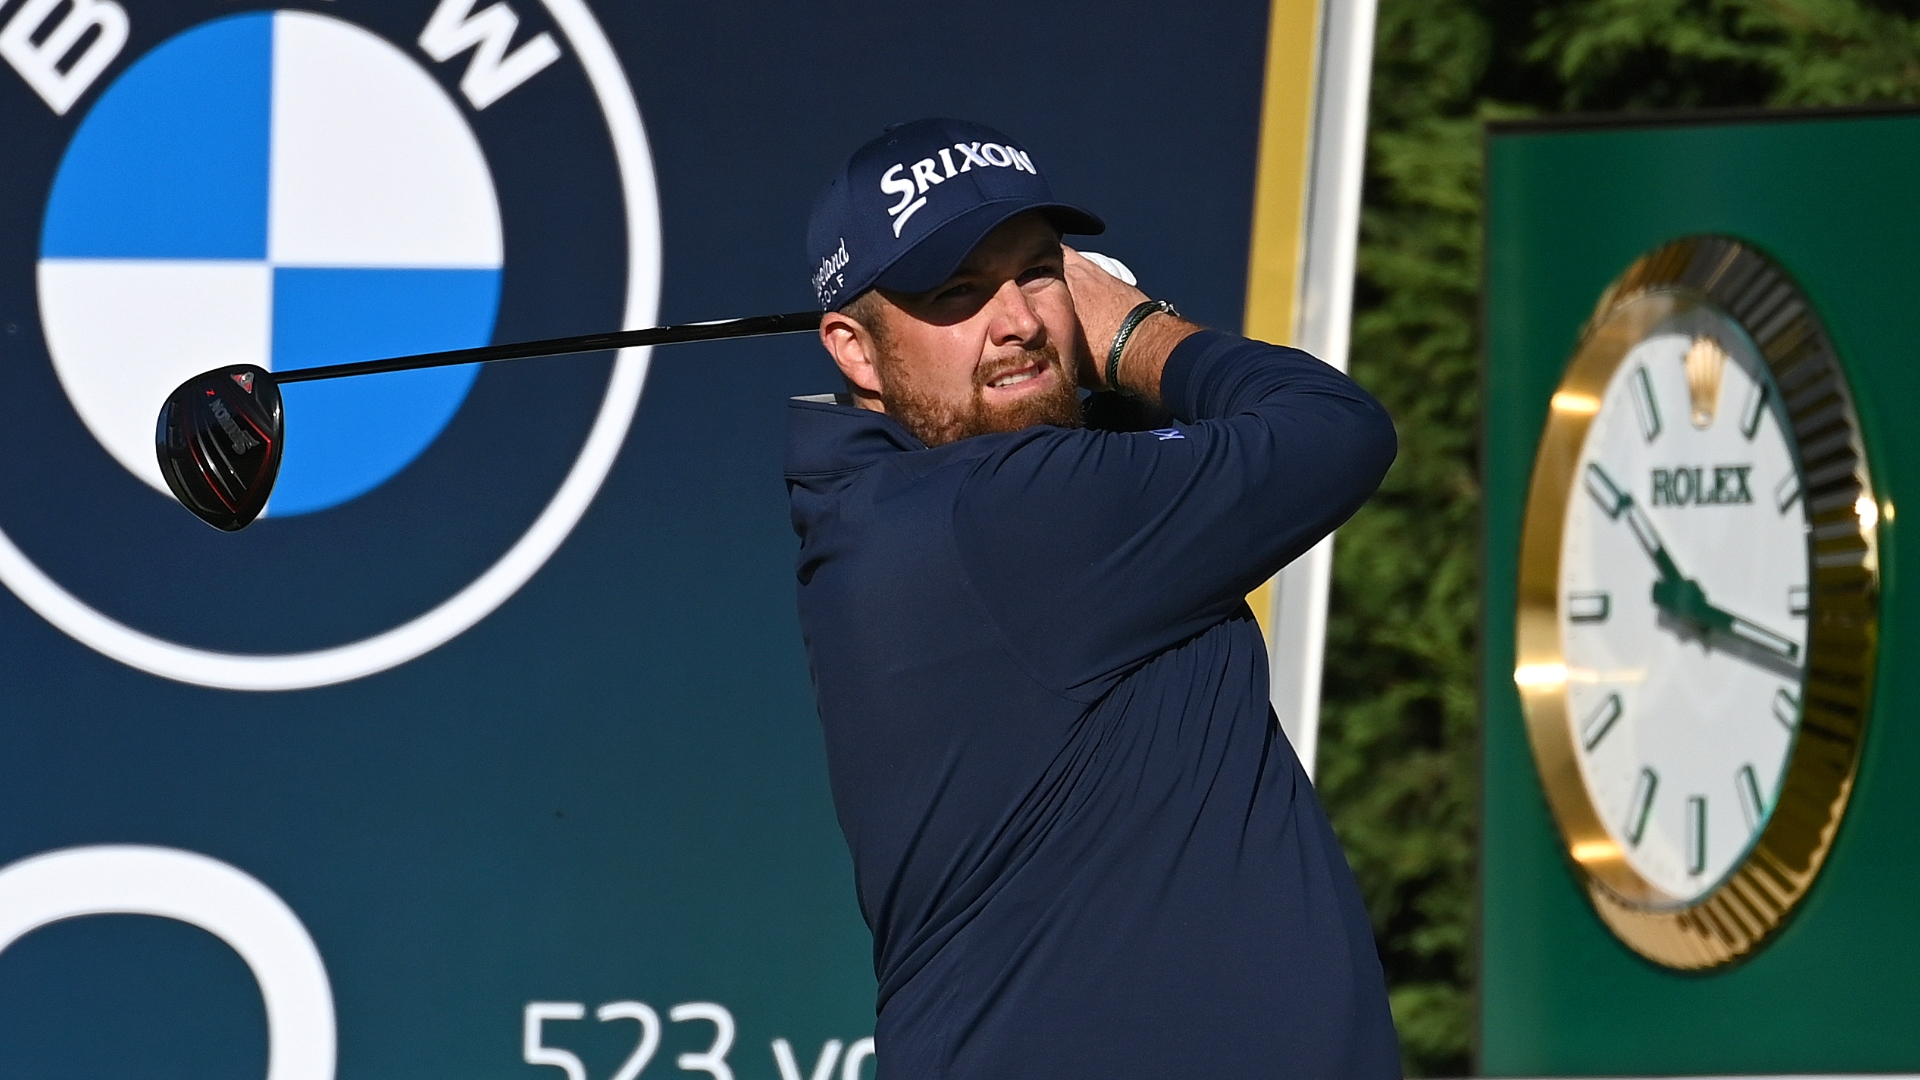 BMW PGA Championship: Lowry, Fitzpatrick lead as Harding misses cut